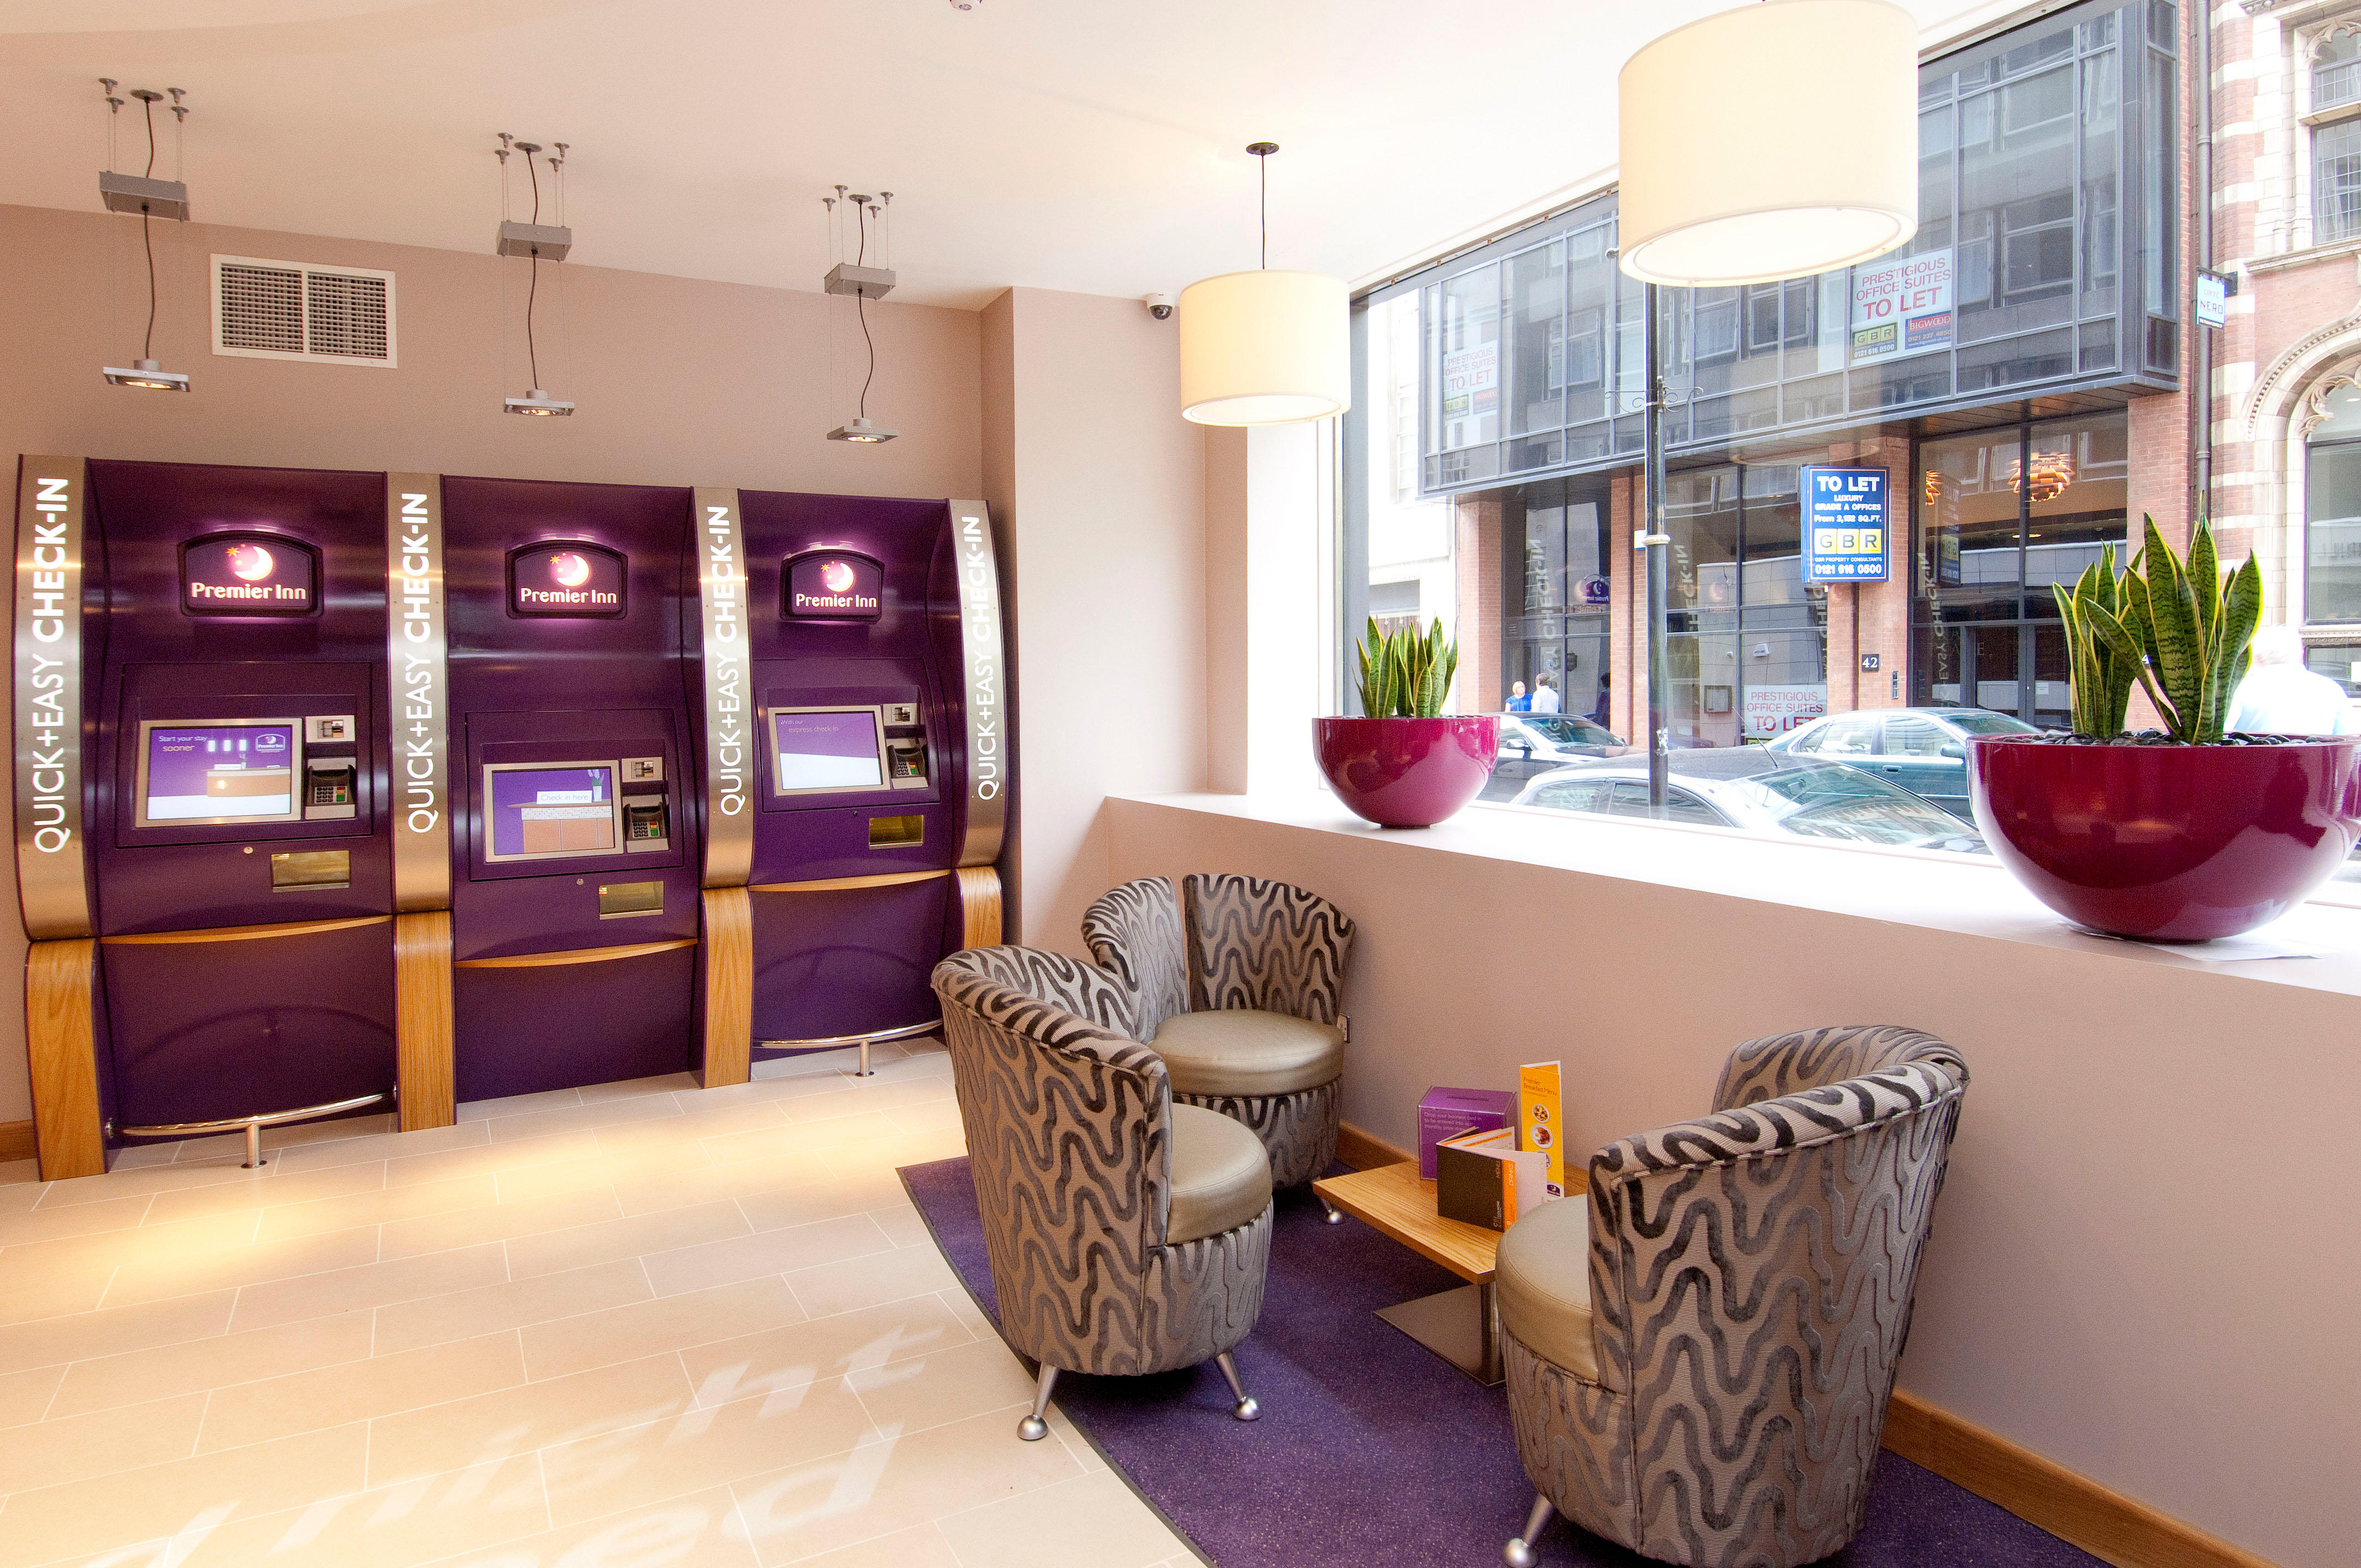 Premier Inn Birmingham City Centre (Waterloo Street) hotel